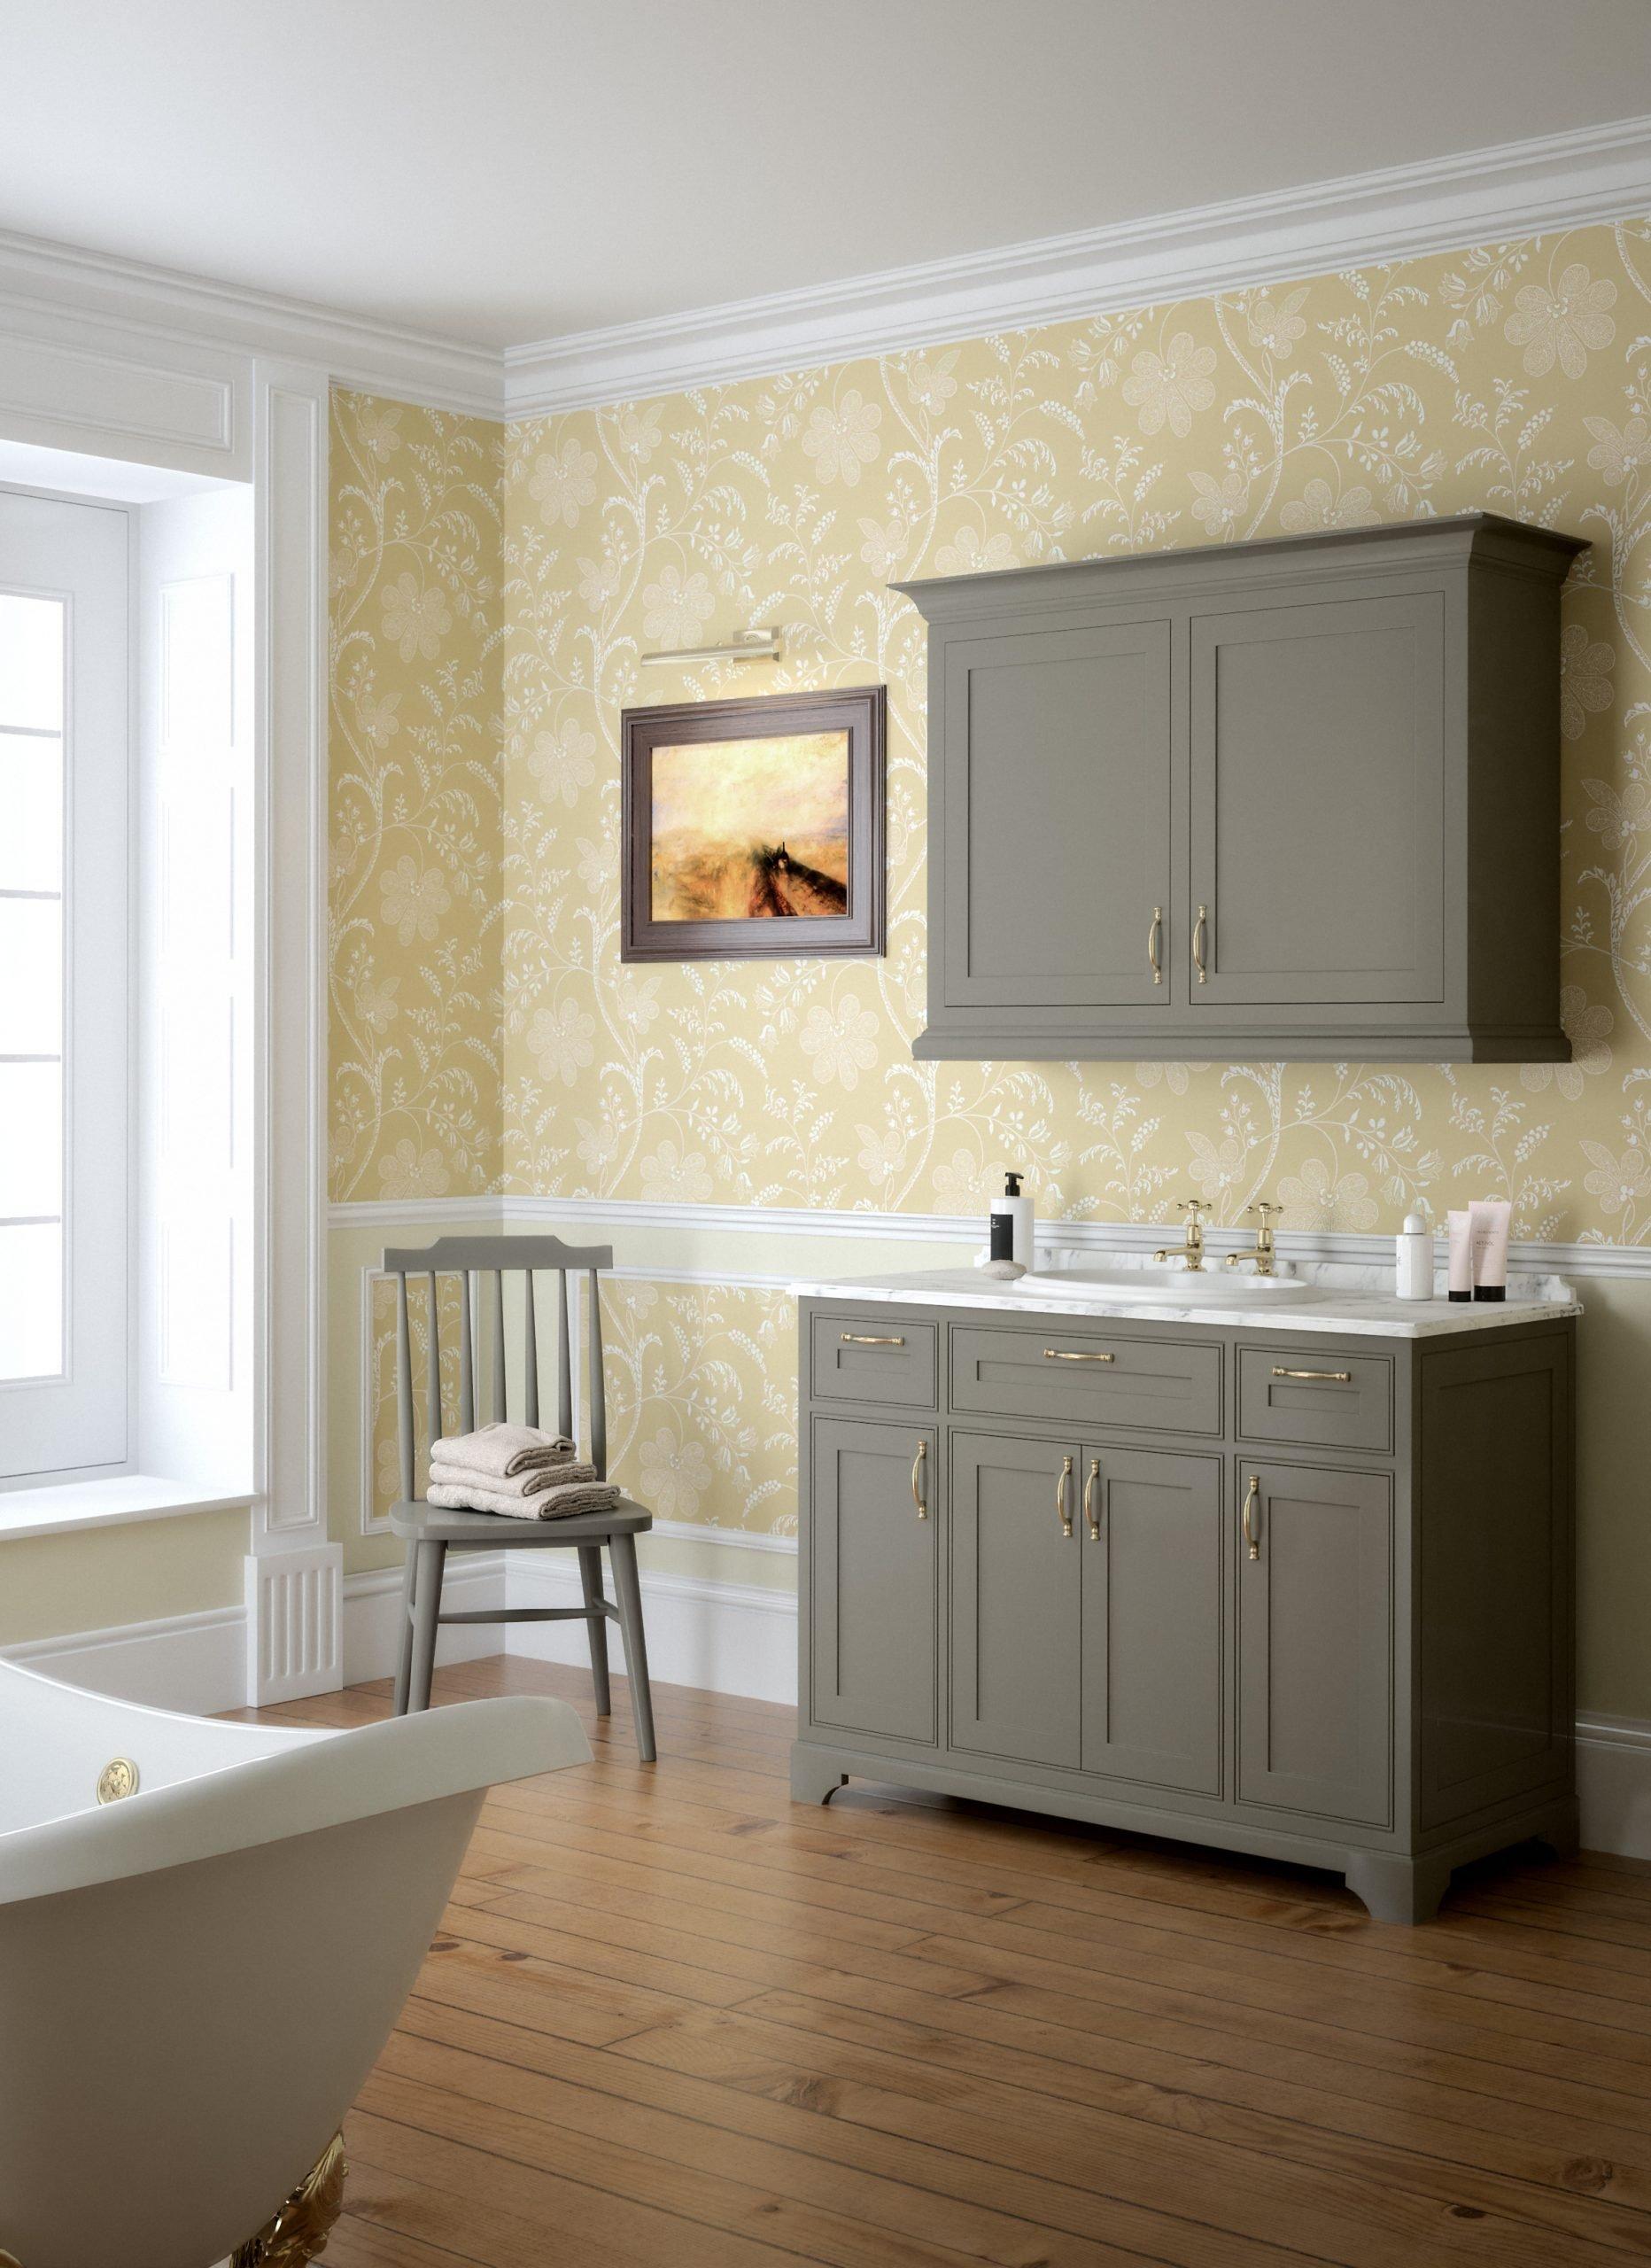 CGI image of period bathroom in yellow.